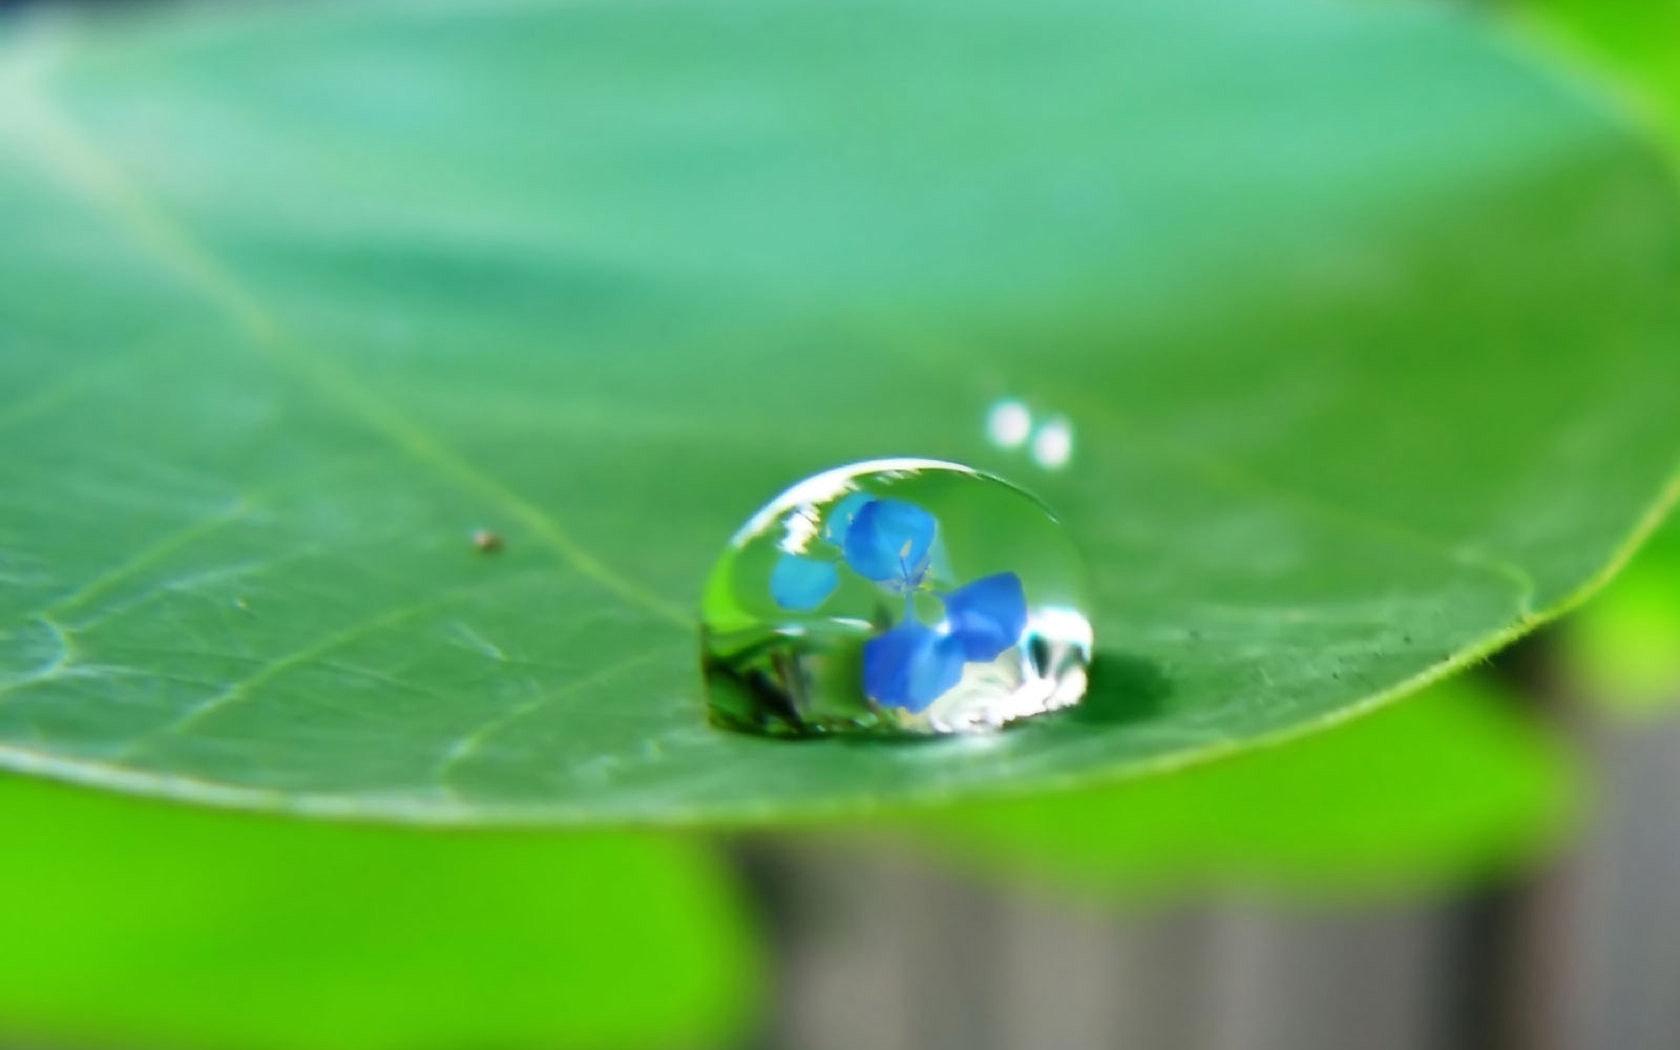 water_drop_on_leaf_w_1680x1050